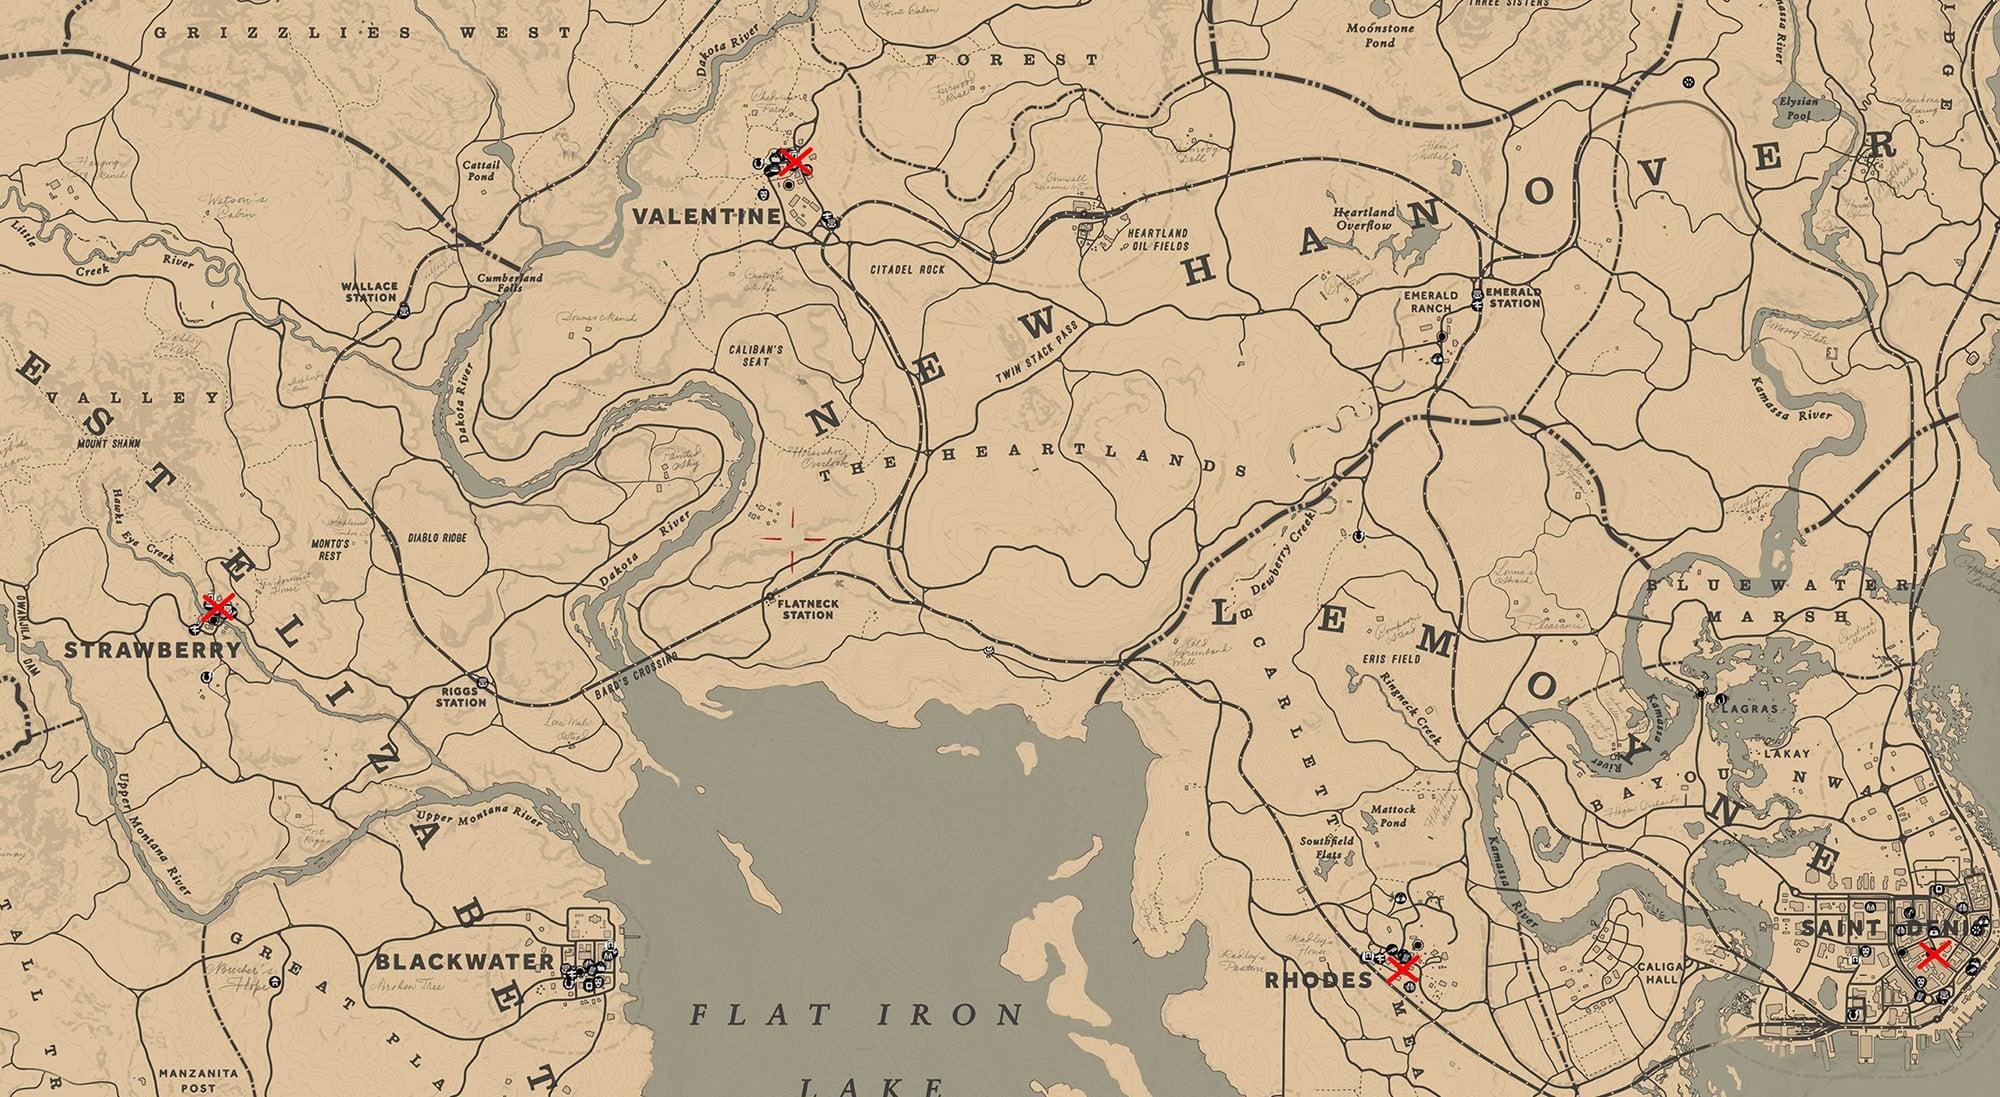 rdr2-pc-red-dead-redemption-2-braquages-progression-totale-100-solution-trouver-gunslingers-map-carte-astuce-soluce